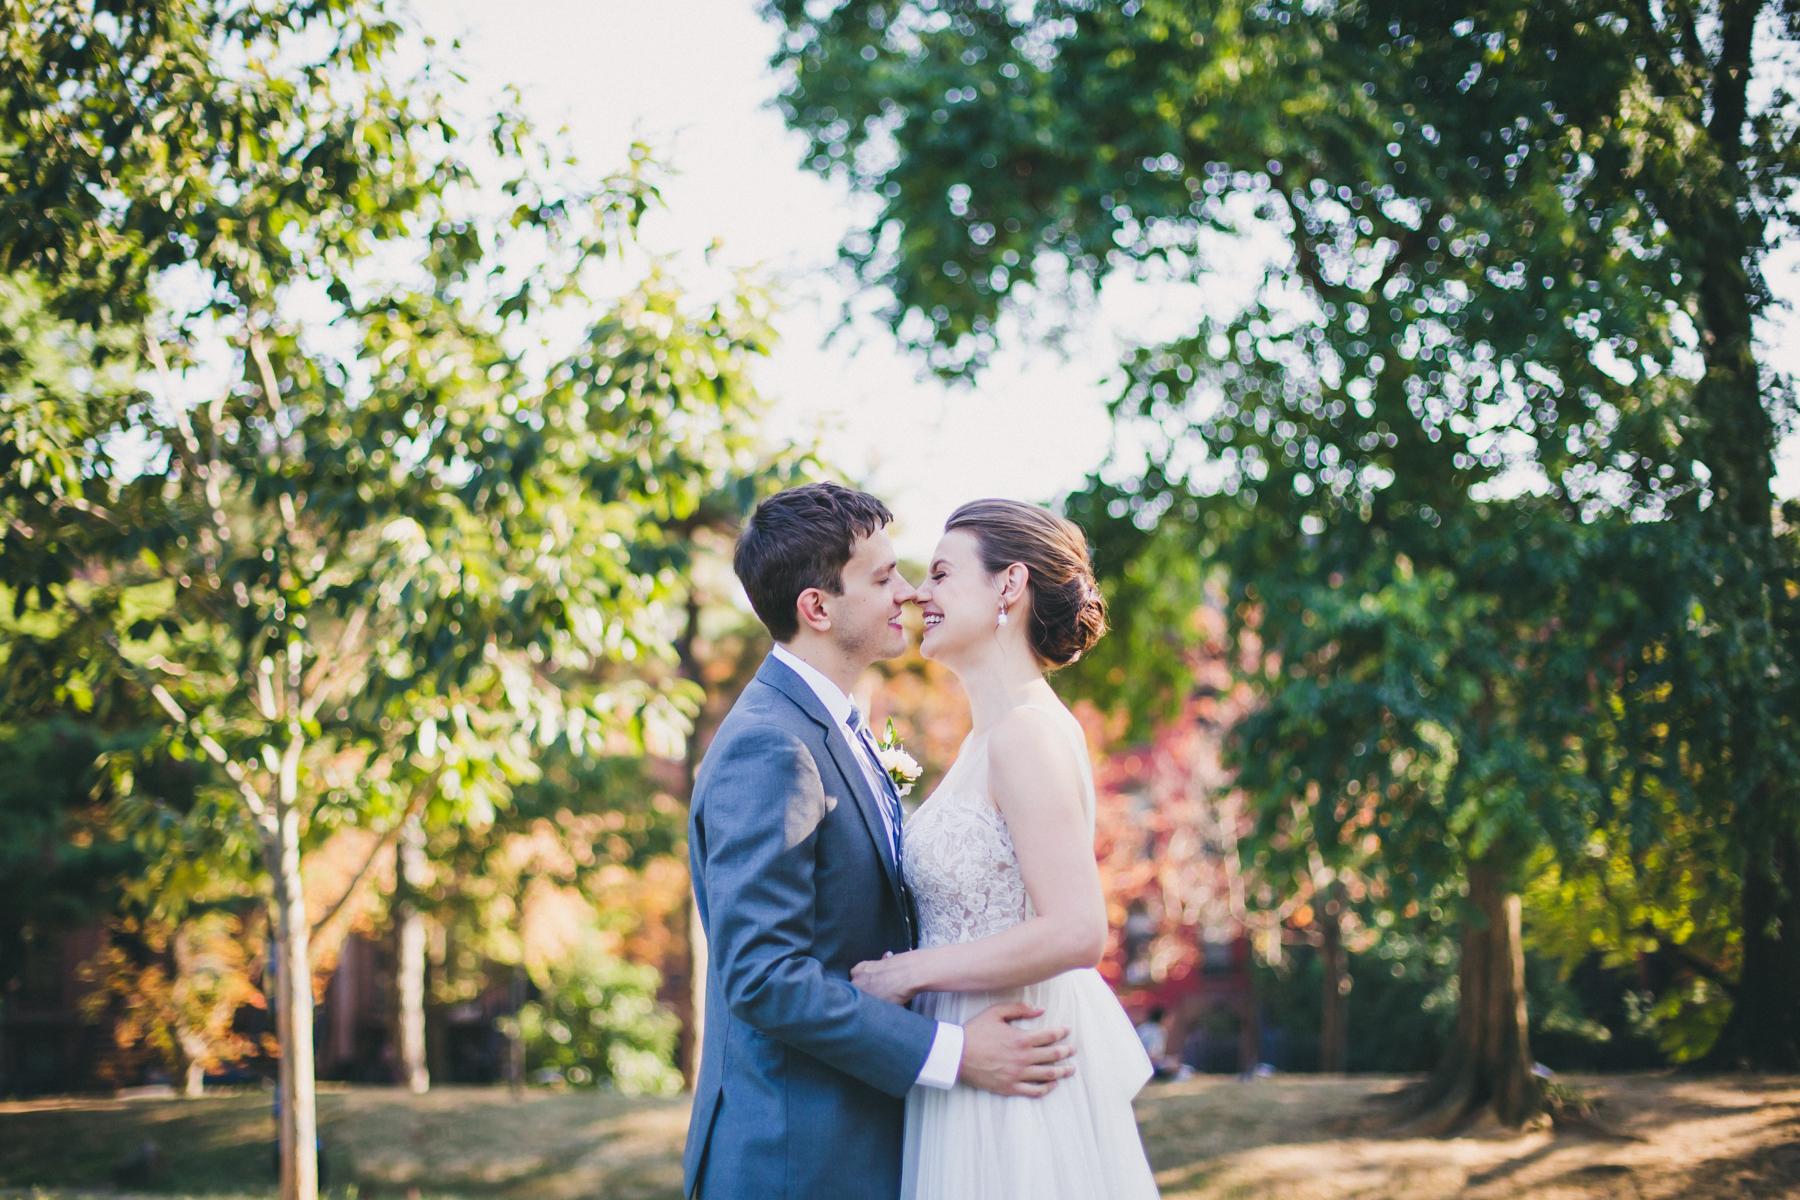 ICI-Restaurant-Fort-Greene-Brooklyn-Intimate-Documentary-Wedding-Photography-Elvira-Kalviste-6.jpg